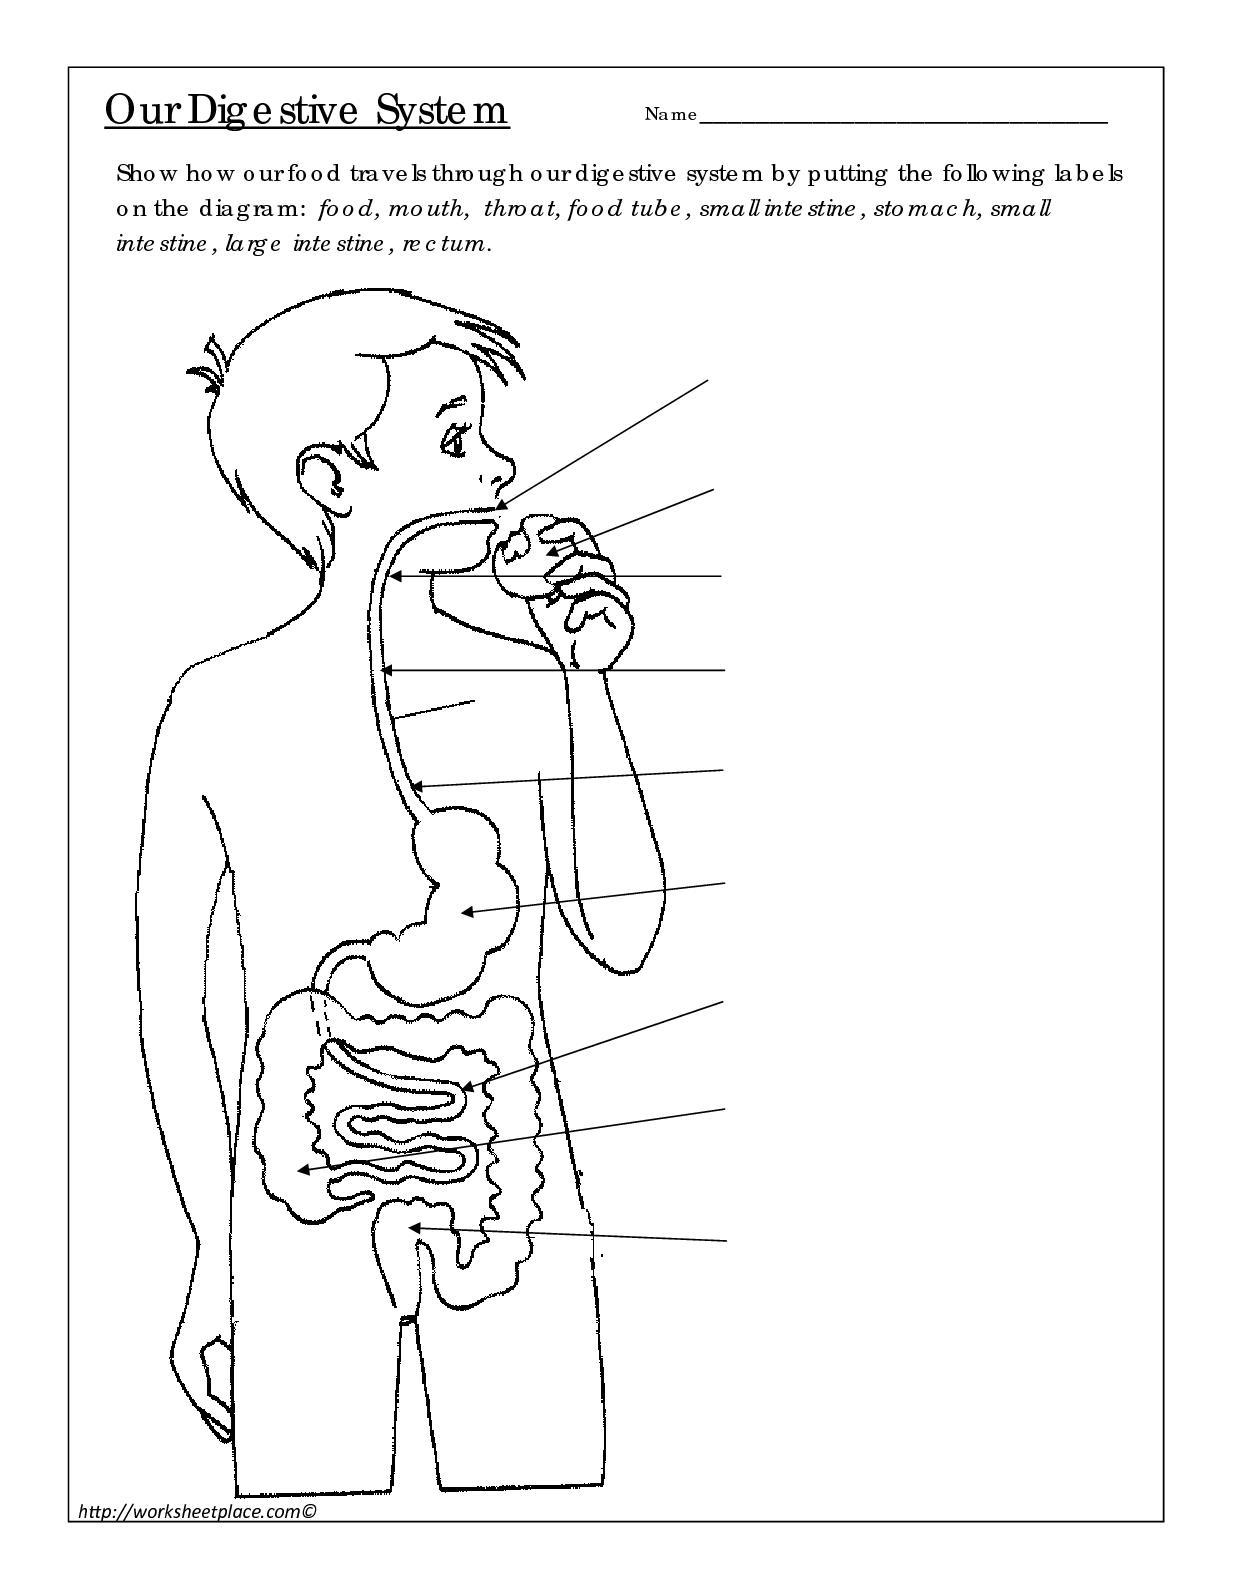 food tube diagram calam  o digestive system  calam  o digestive system